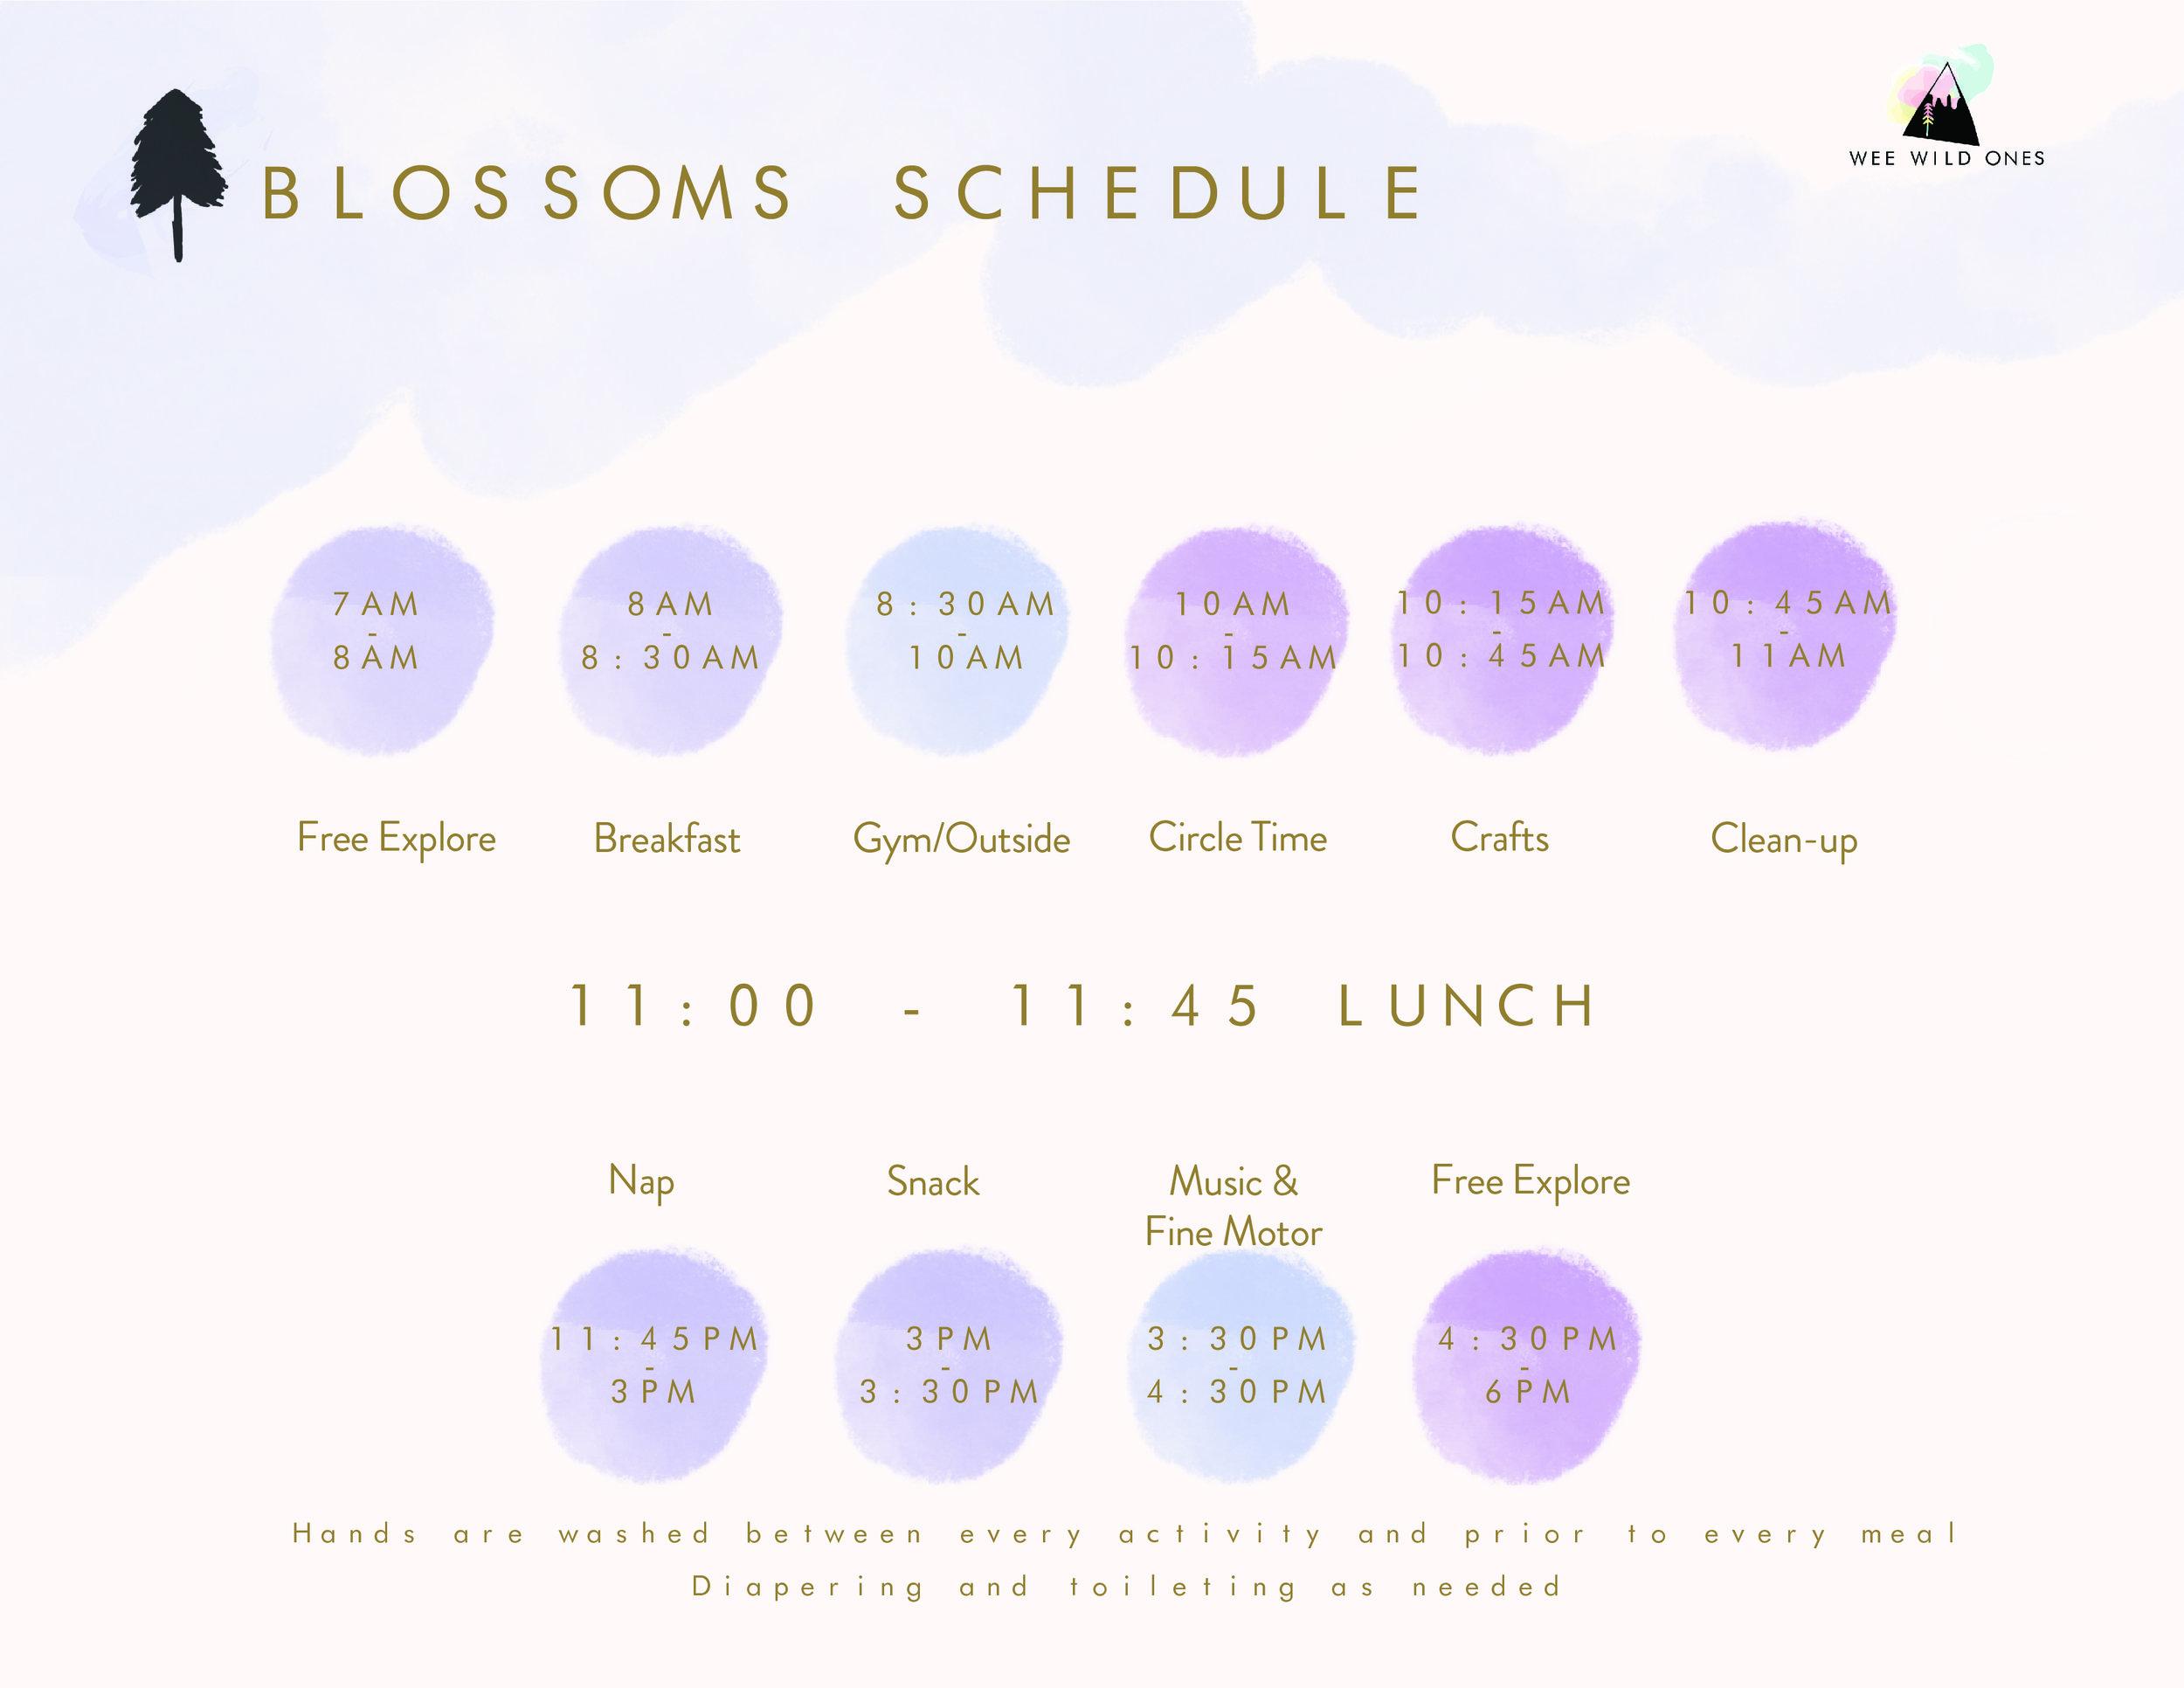 190312 Blossoms Schedule-01.jpg